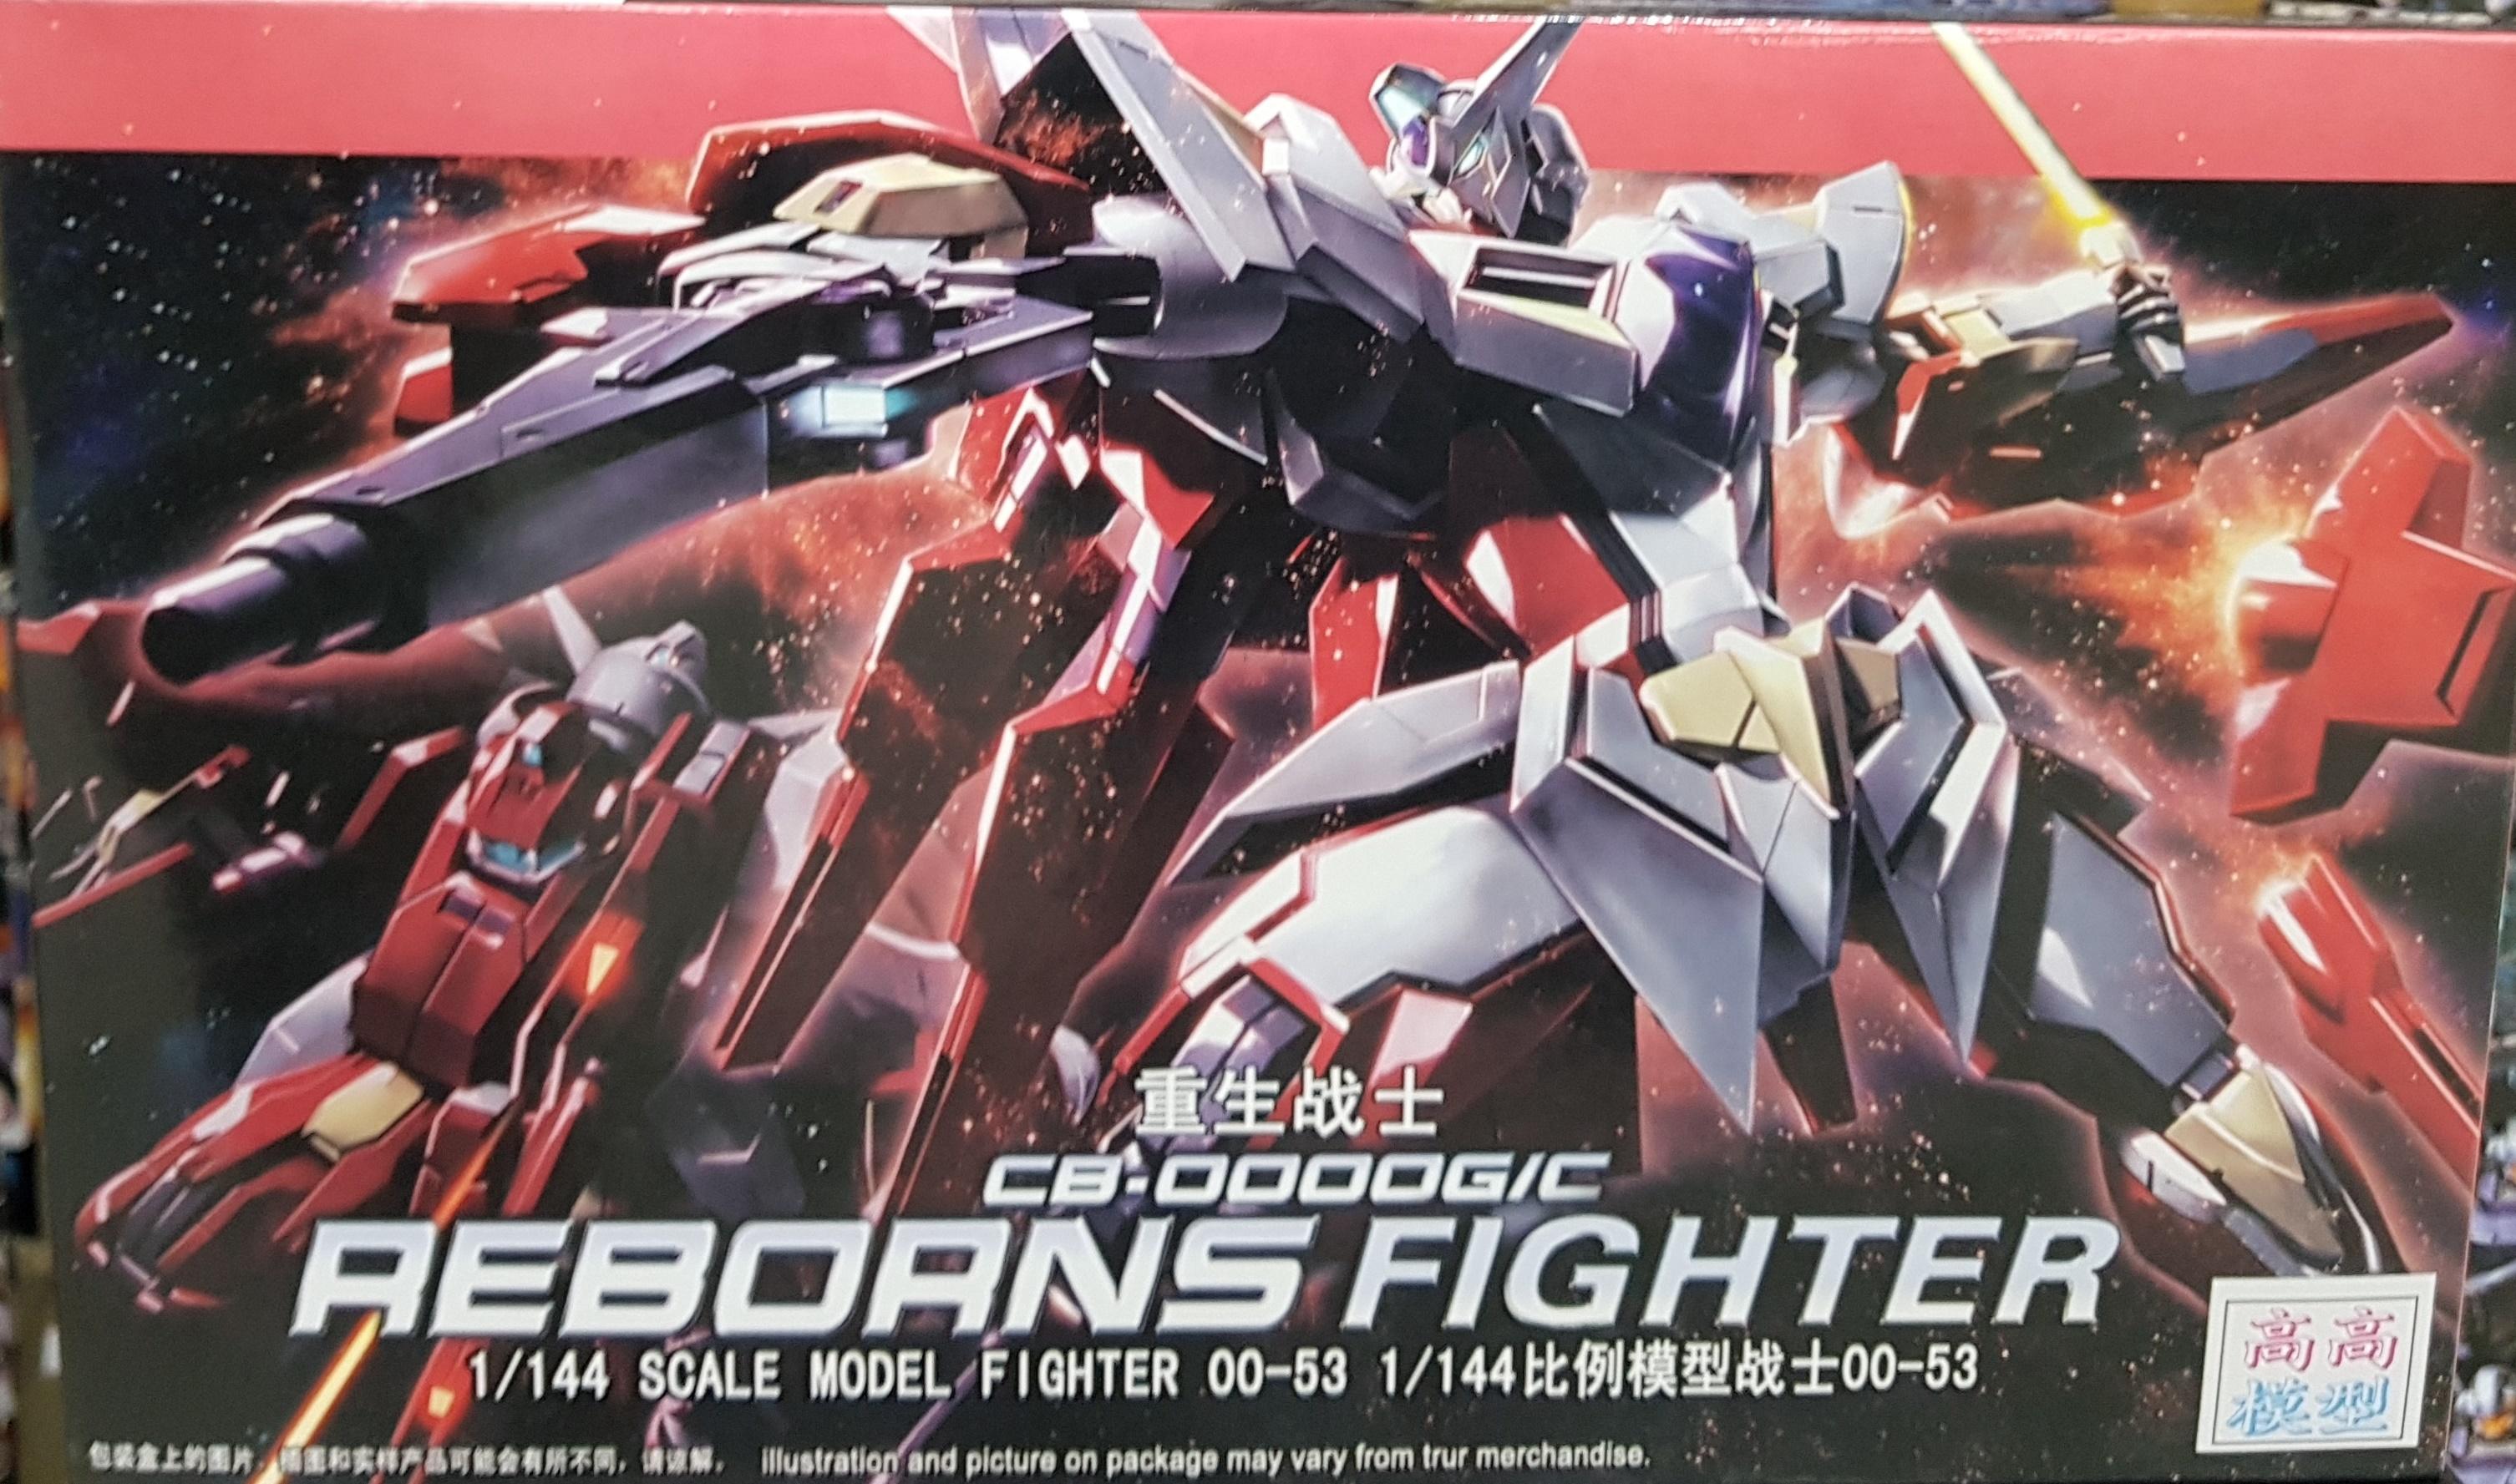 Reborns Fighter